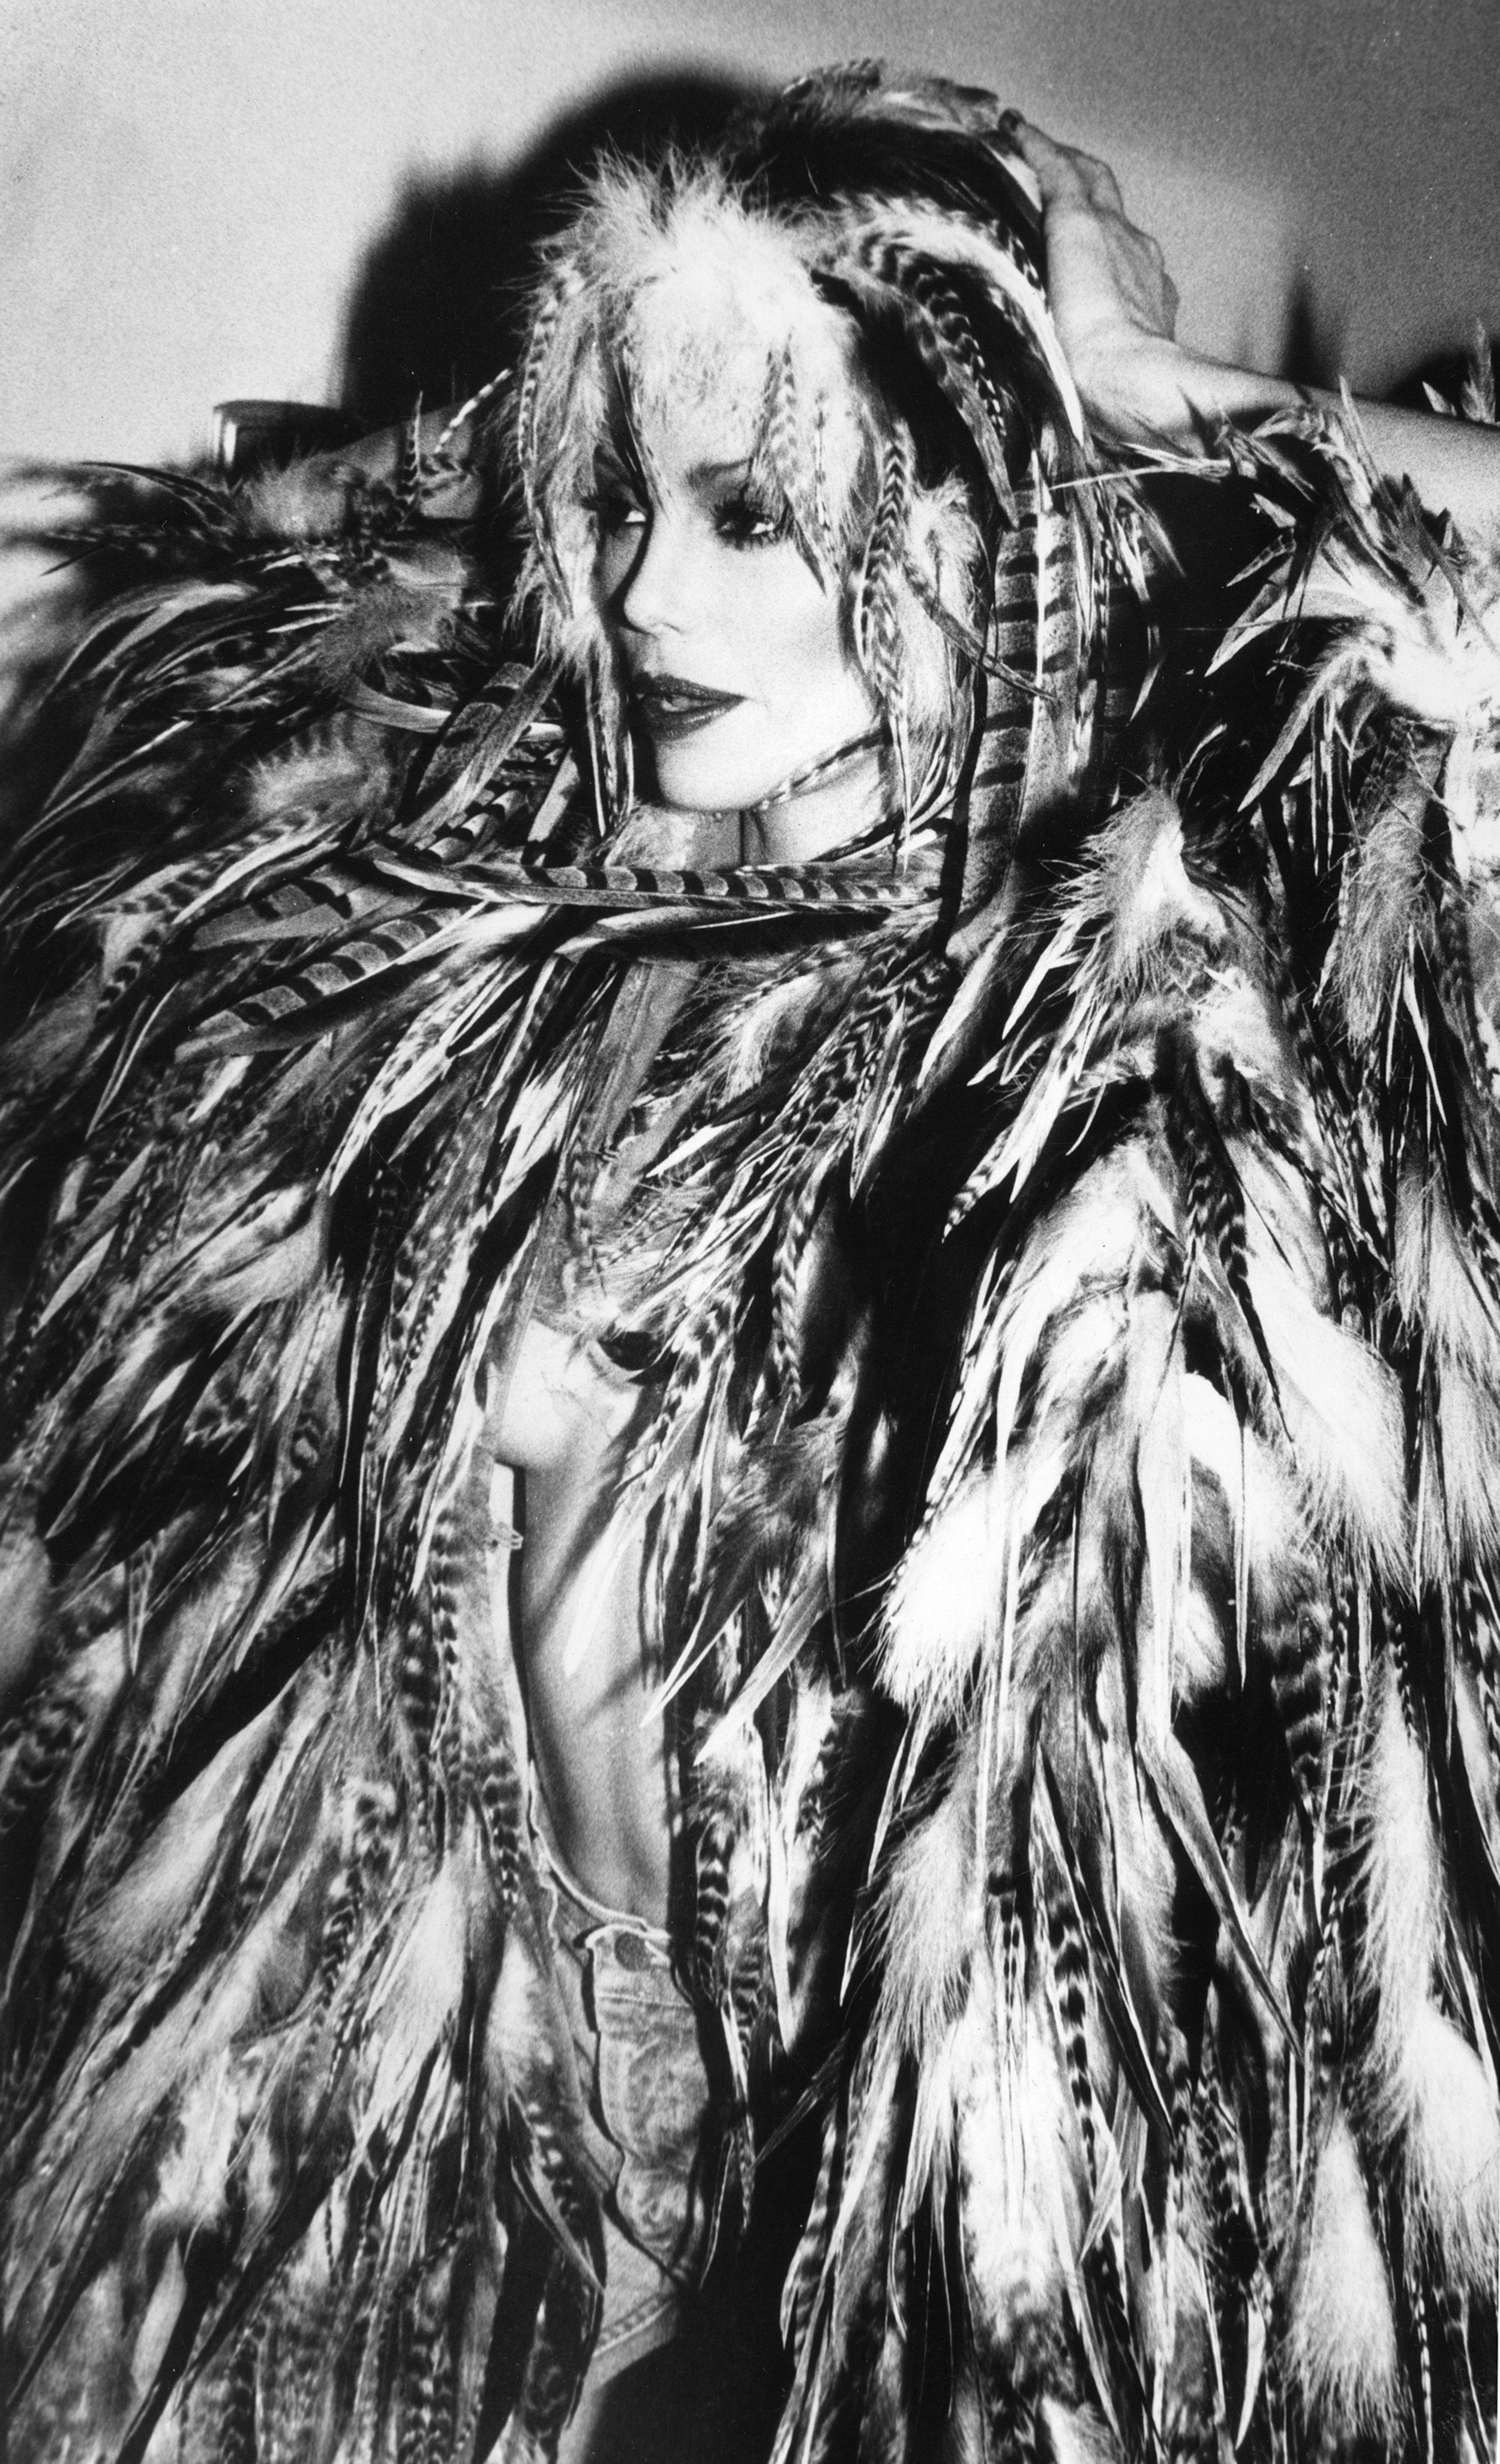 Rose Hartman - Feathered coat.jpeg